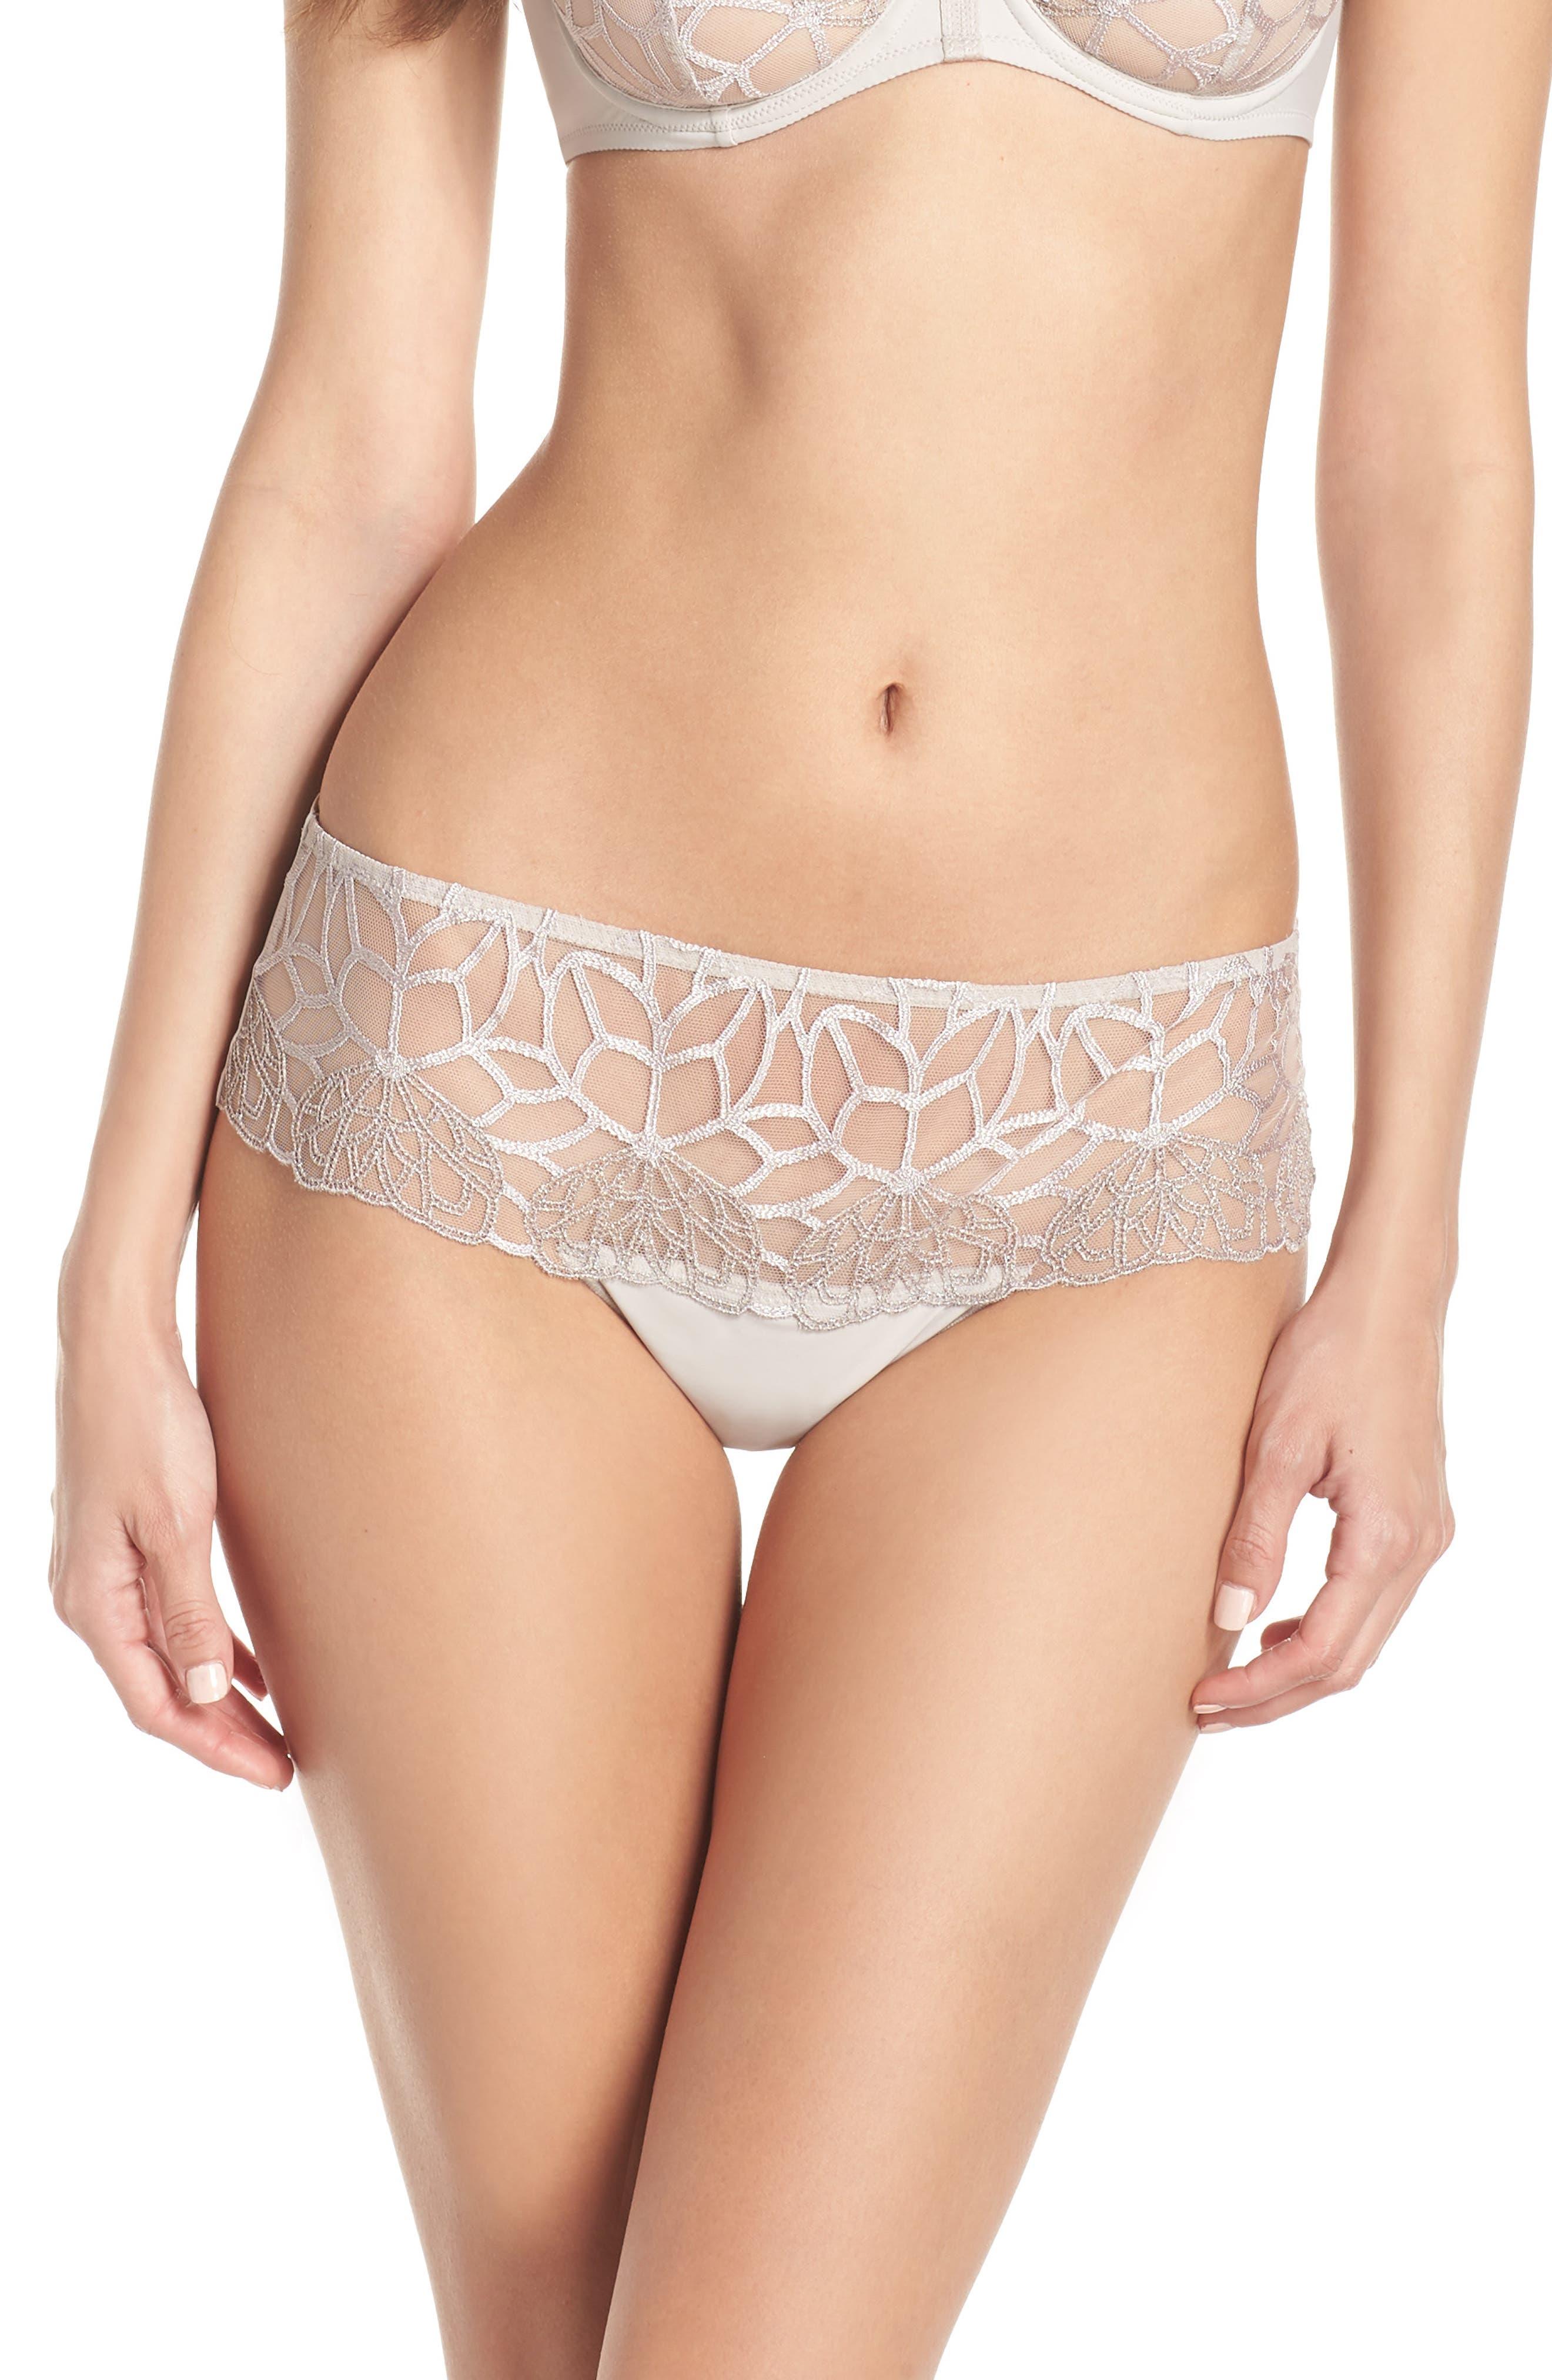 SIMONE PERELE Java Hipster Panties, Main, color, LINEN